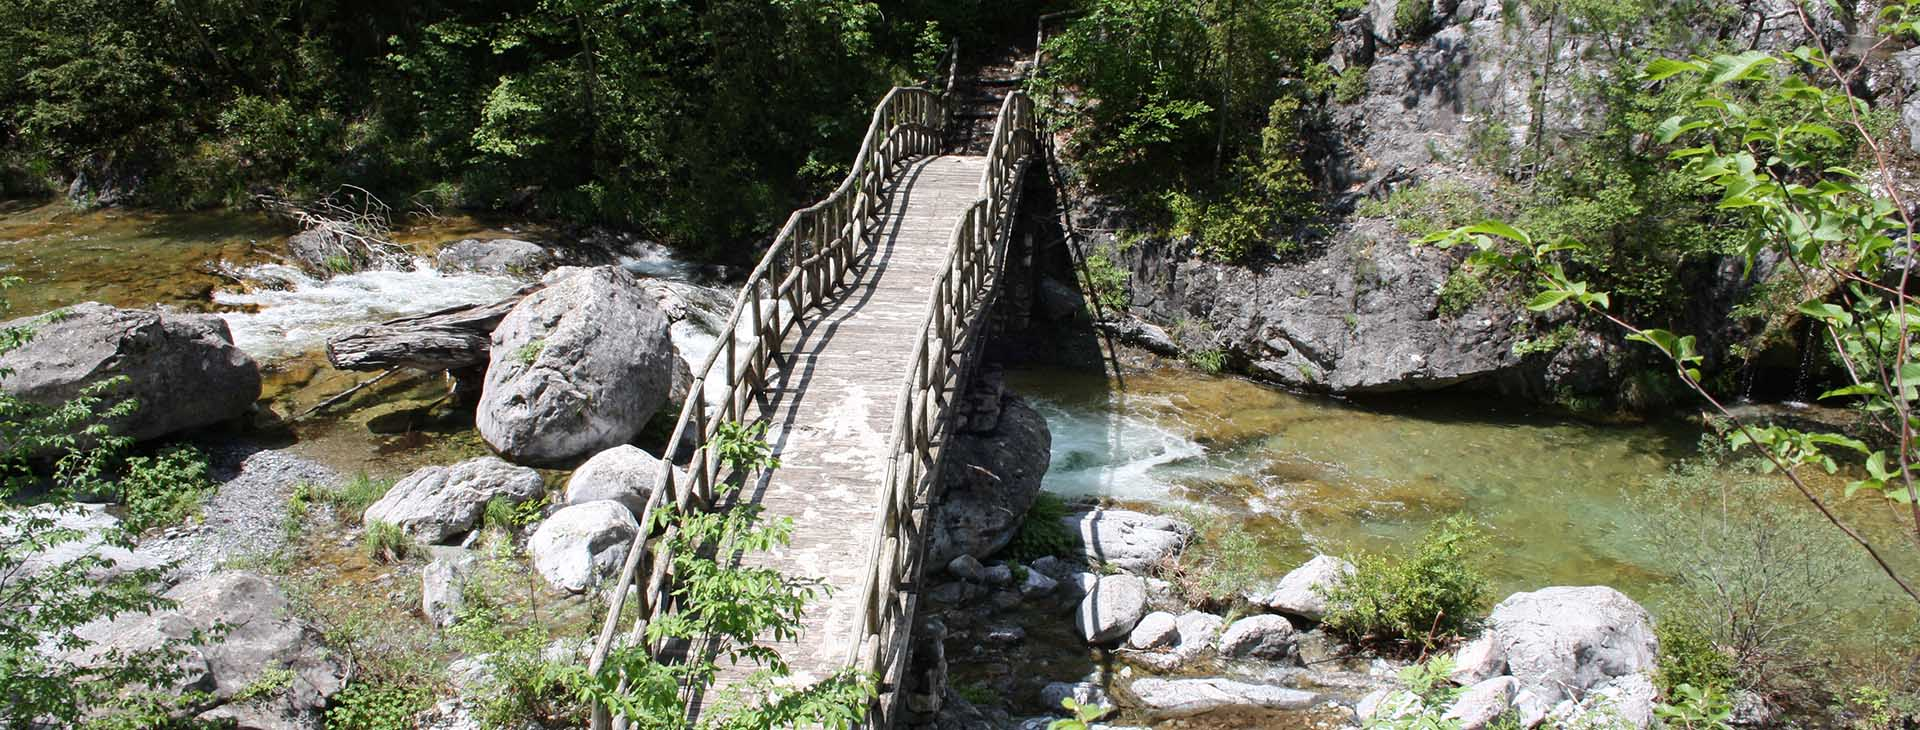 Bridge on Enipeas Gorge, Mt. Olympus, Pieria